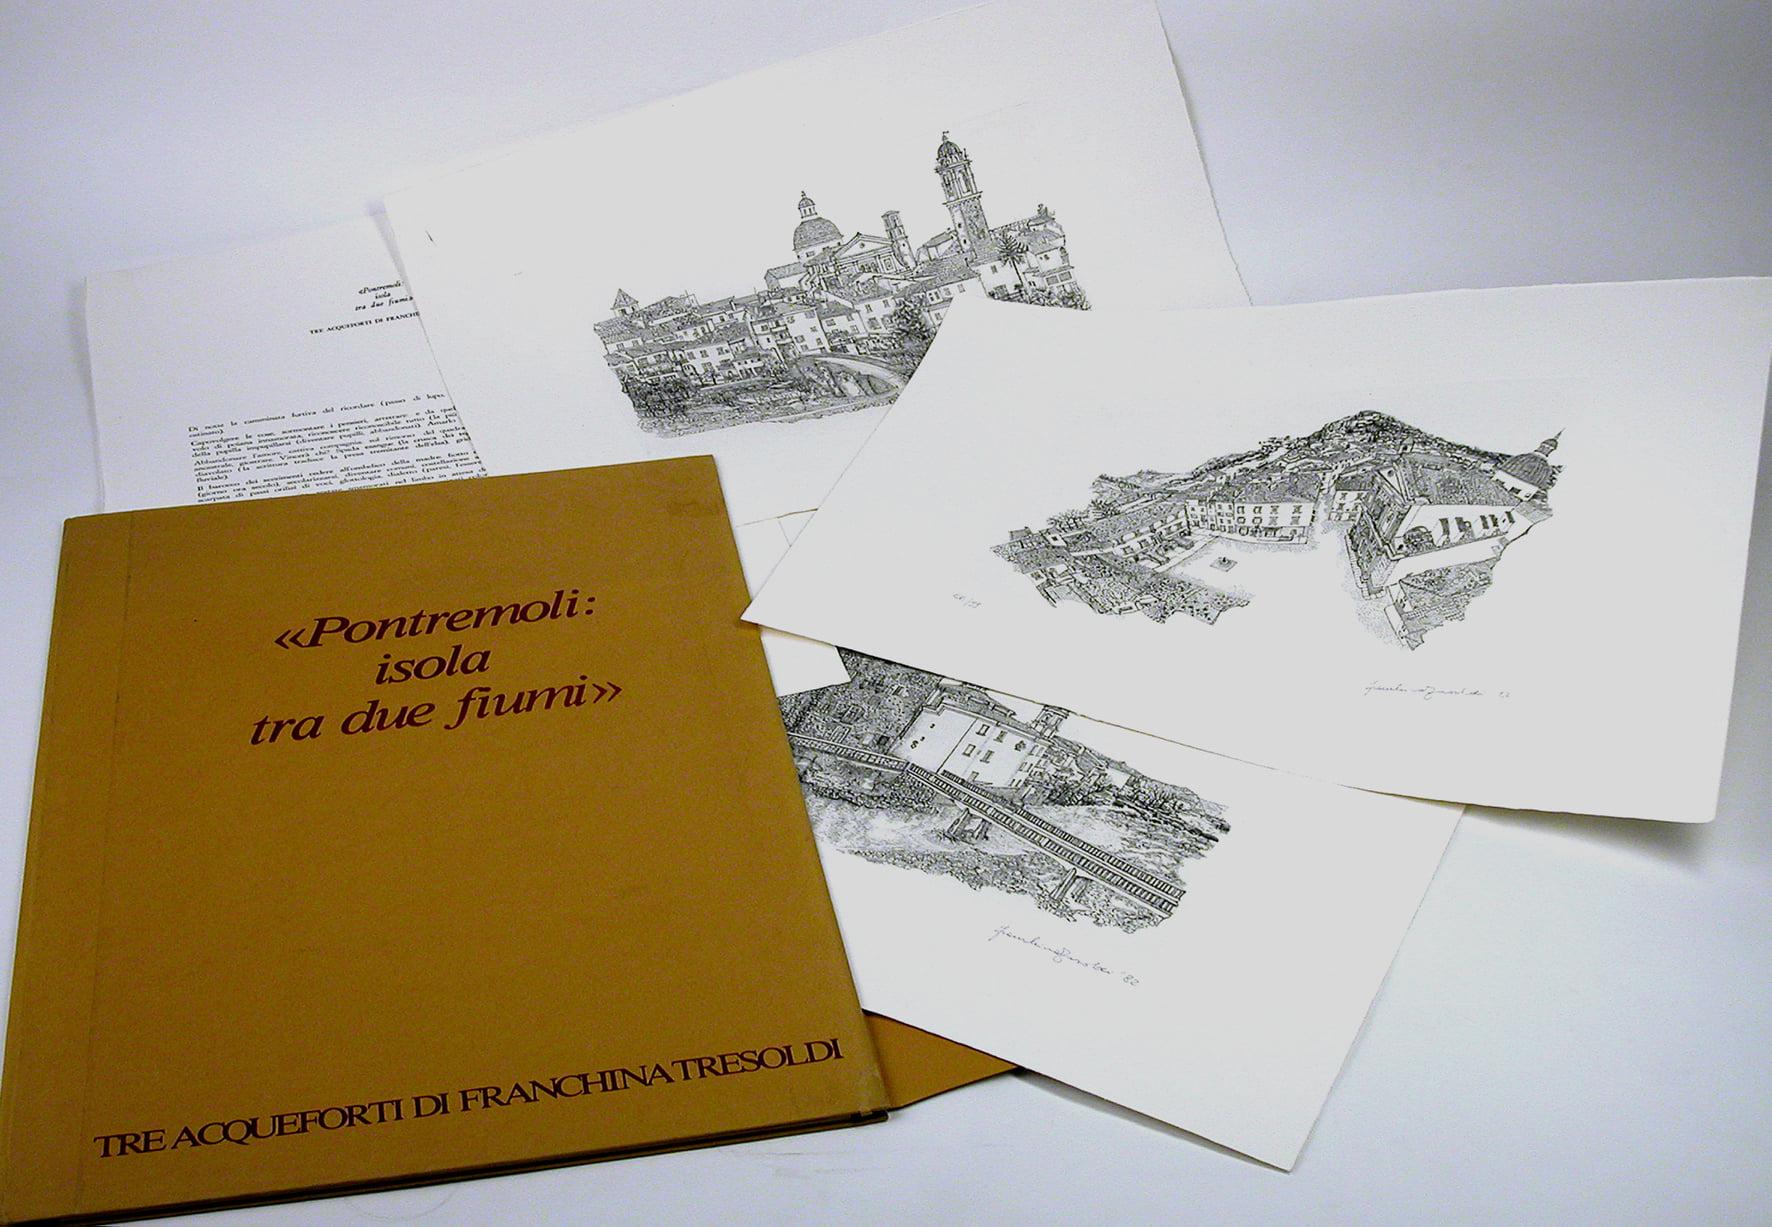 franchina-tresoldi-artigiani-della-carta-lodi-thumbnail